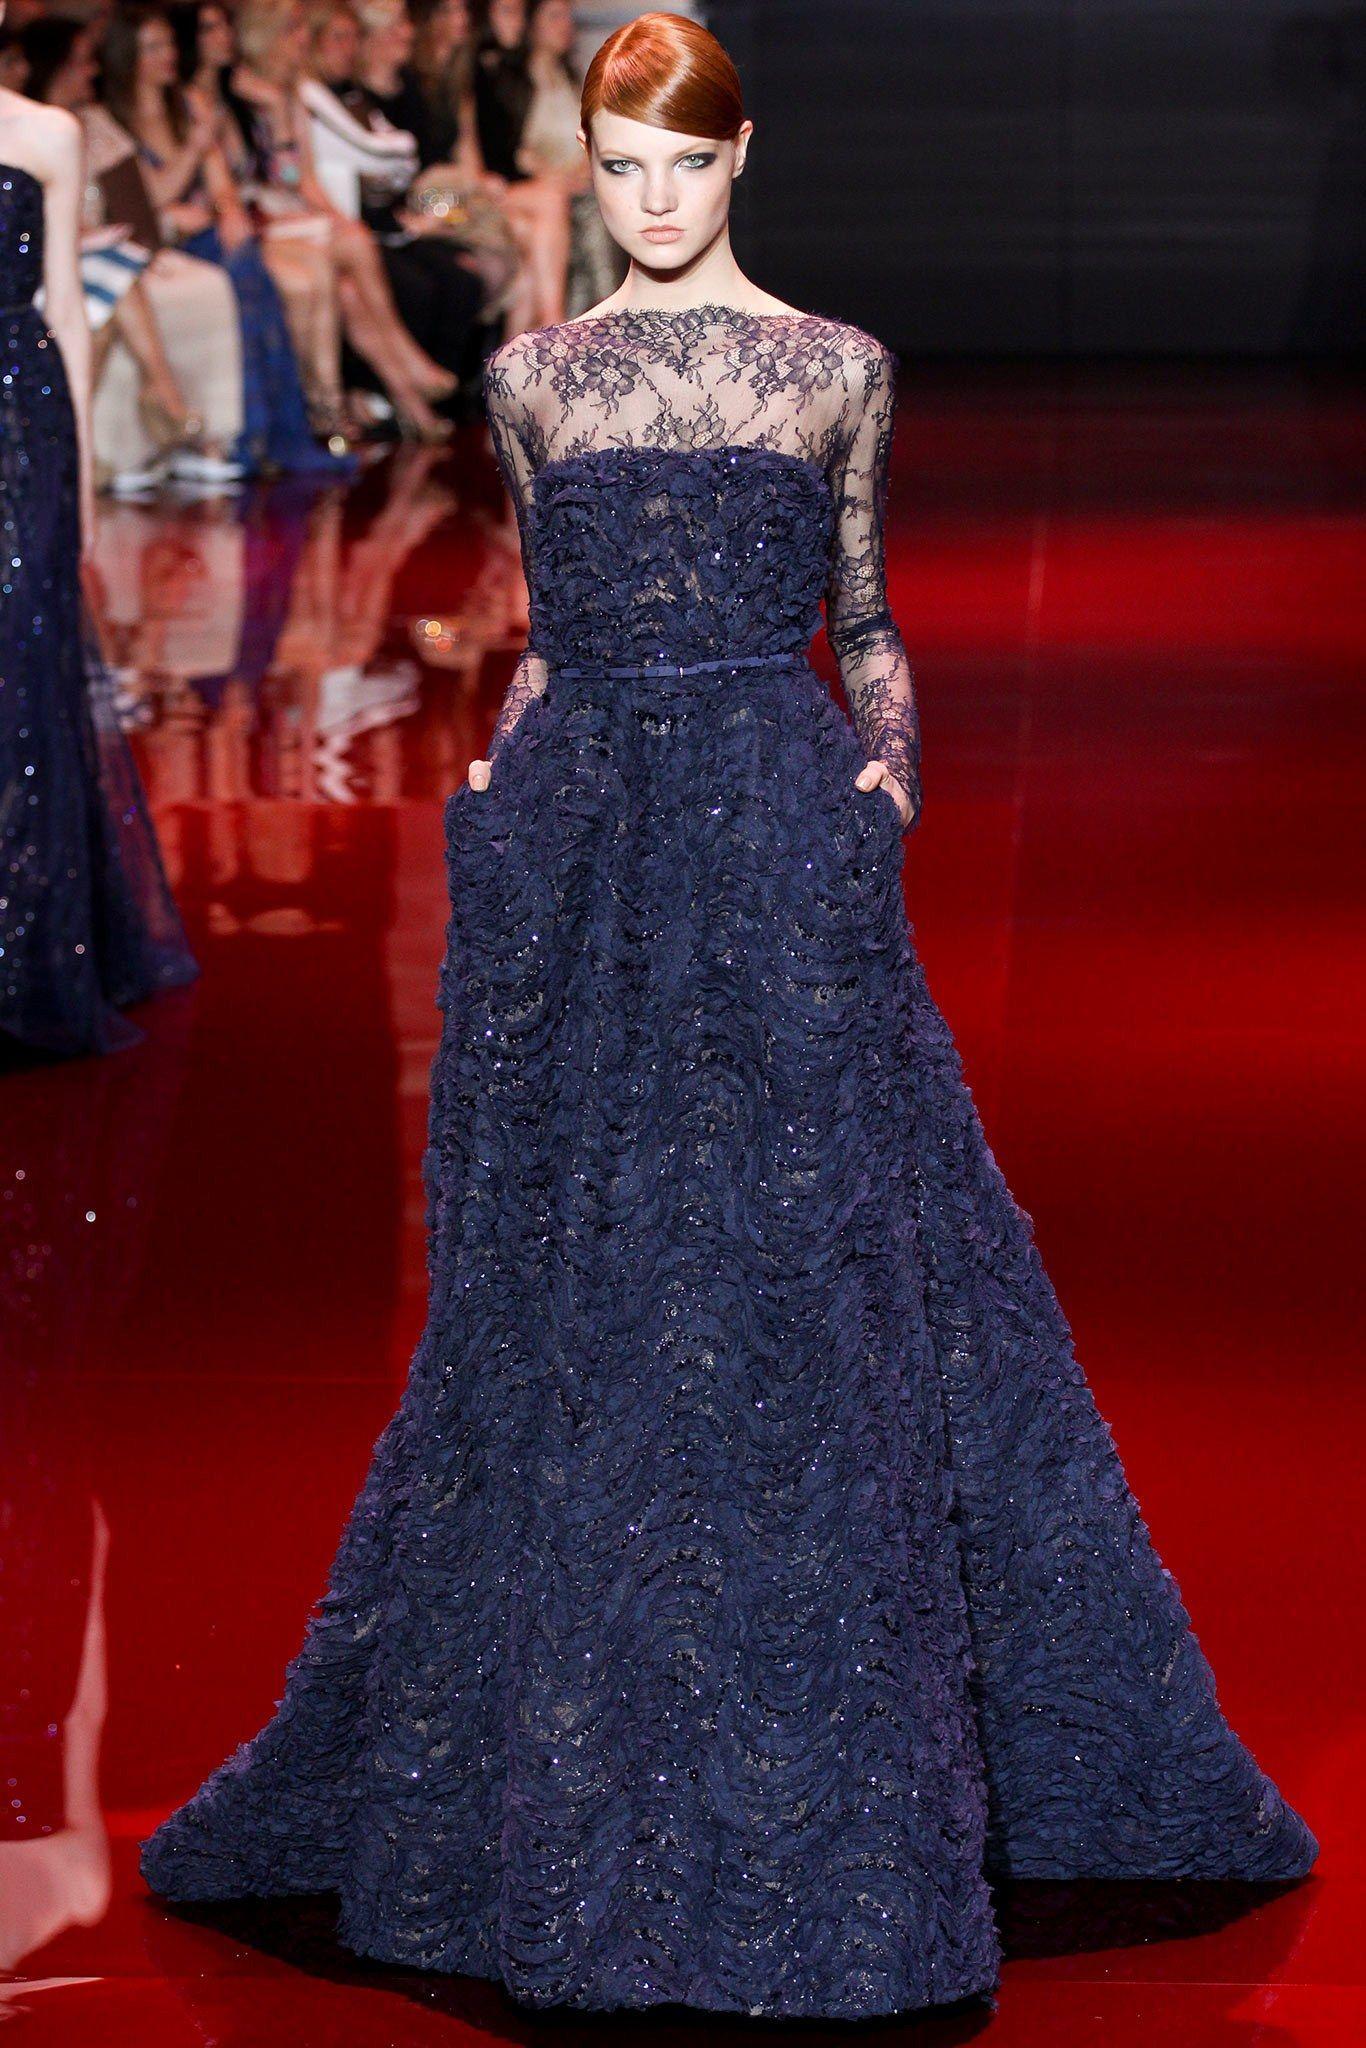 Elie Saab Fall 2013 Couture Fashion Show - Anastasia Ivanova (Women)